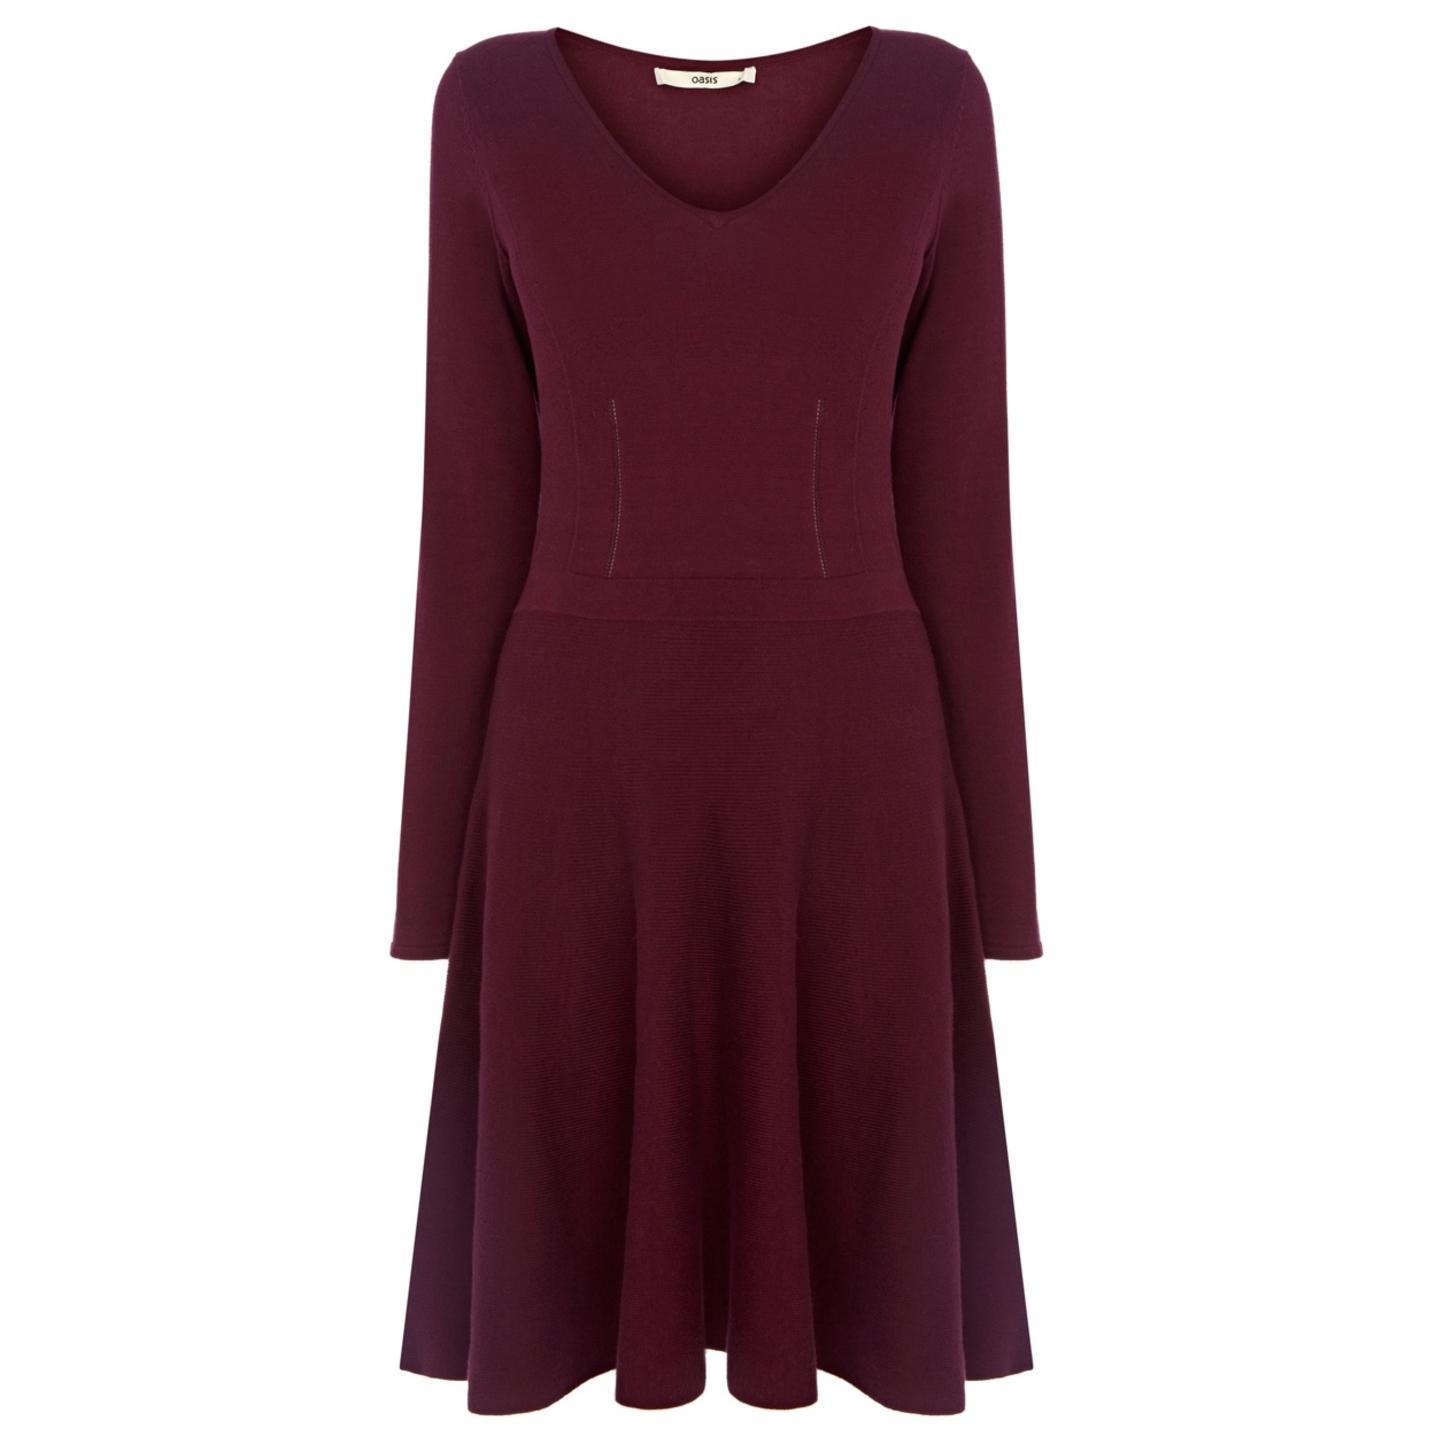 Long Sleeve Fit N Flare Dress - Choice 2017